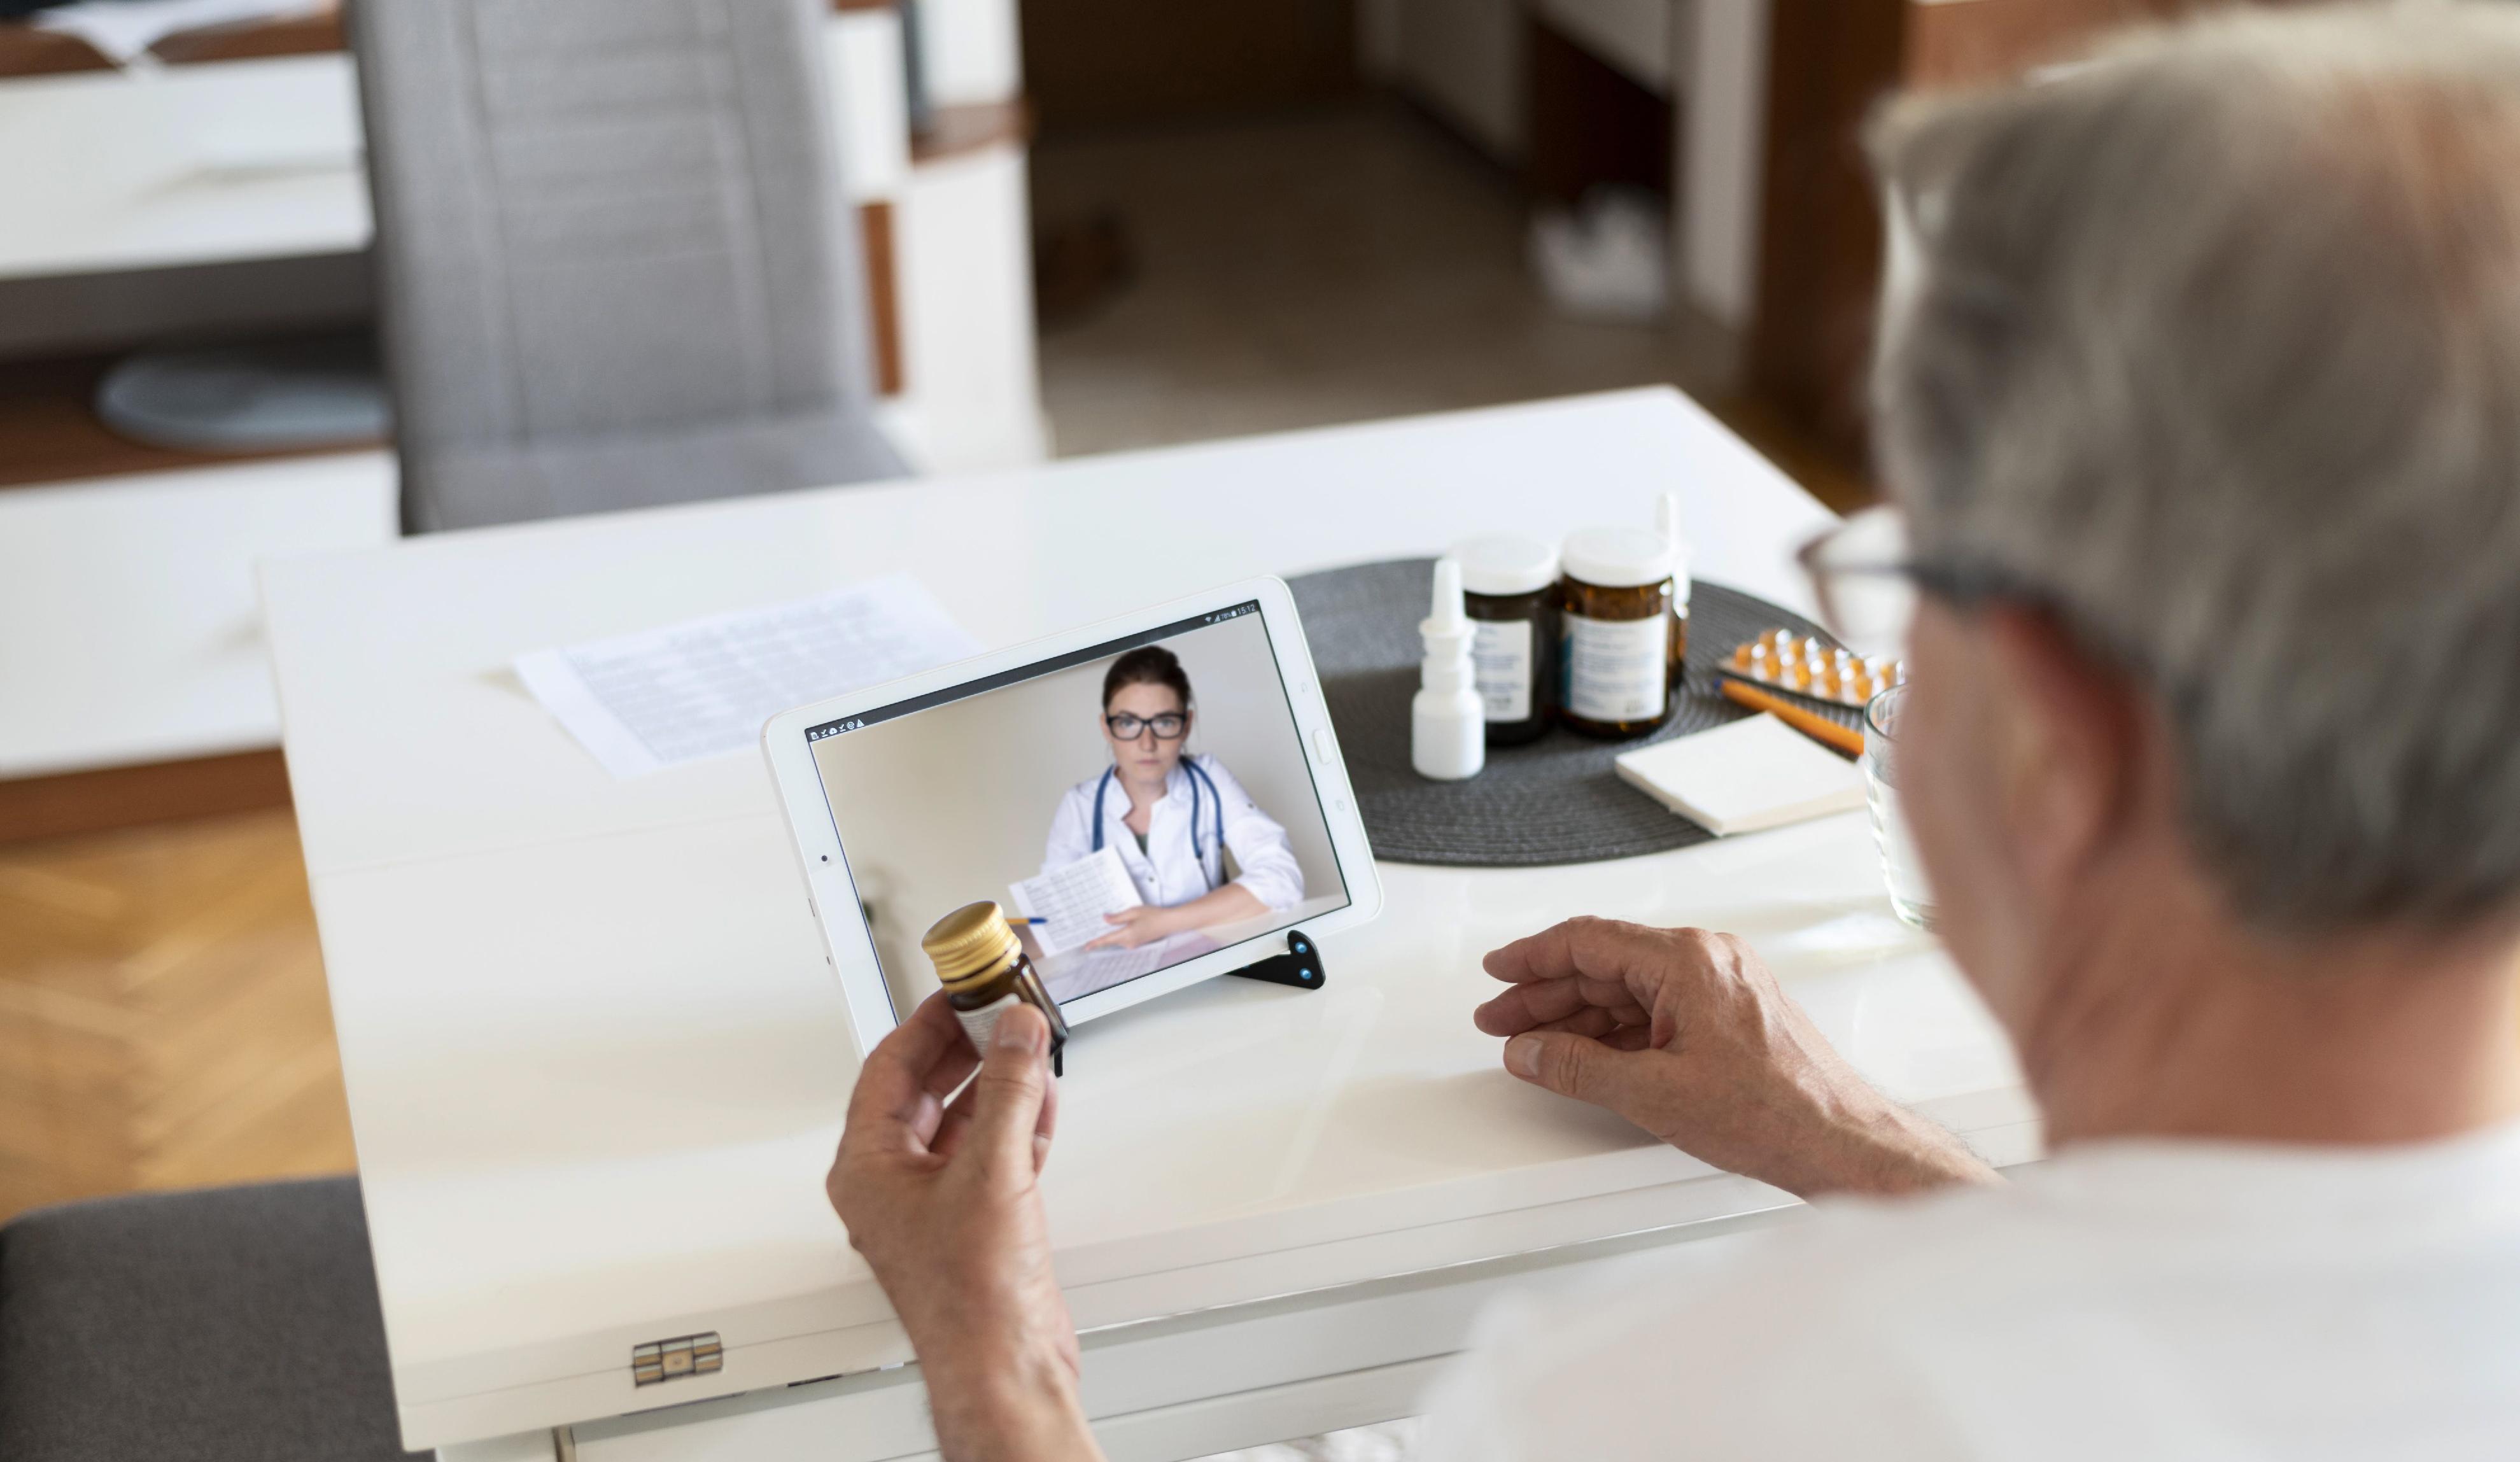 La telemedicina implica a los pacientes a utilizarla